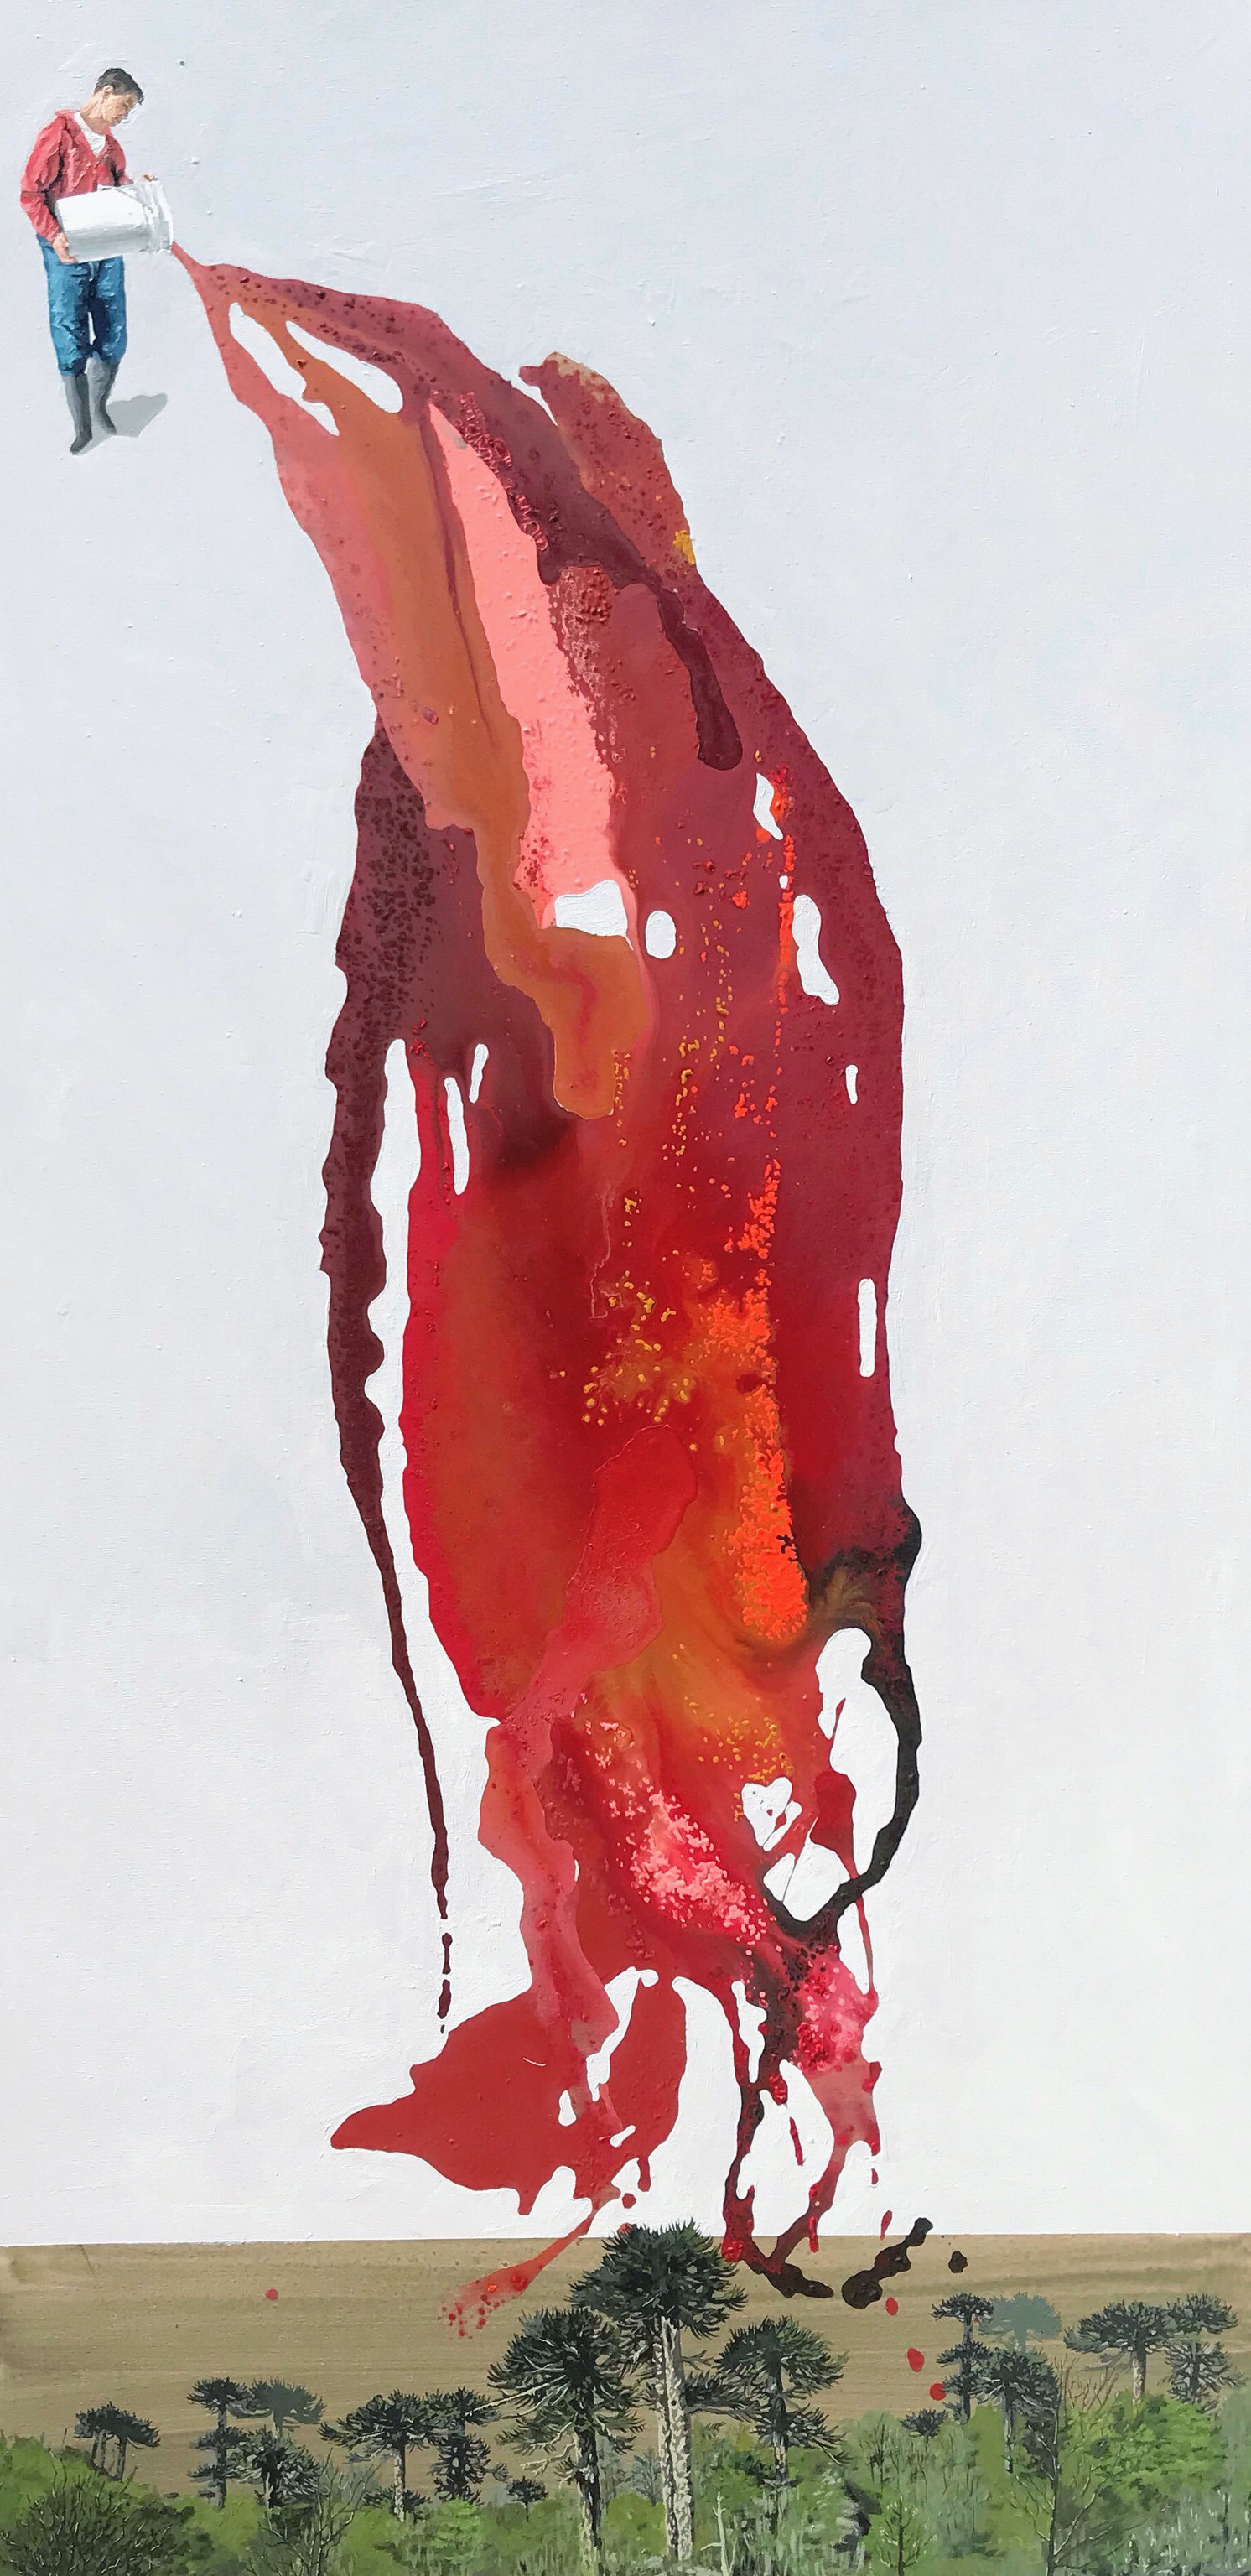 Acrílico sobre tela, 200 x 100 cm. 2019